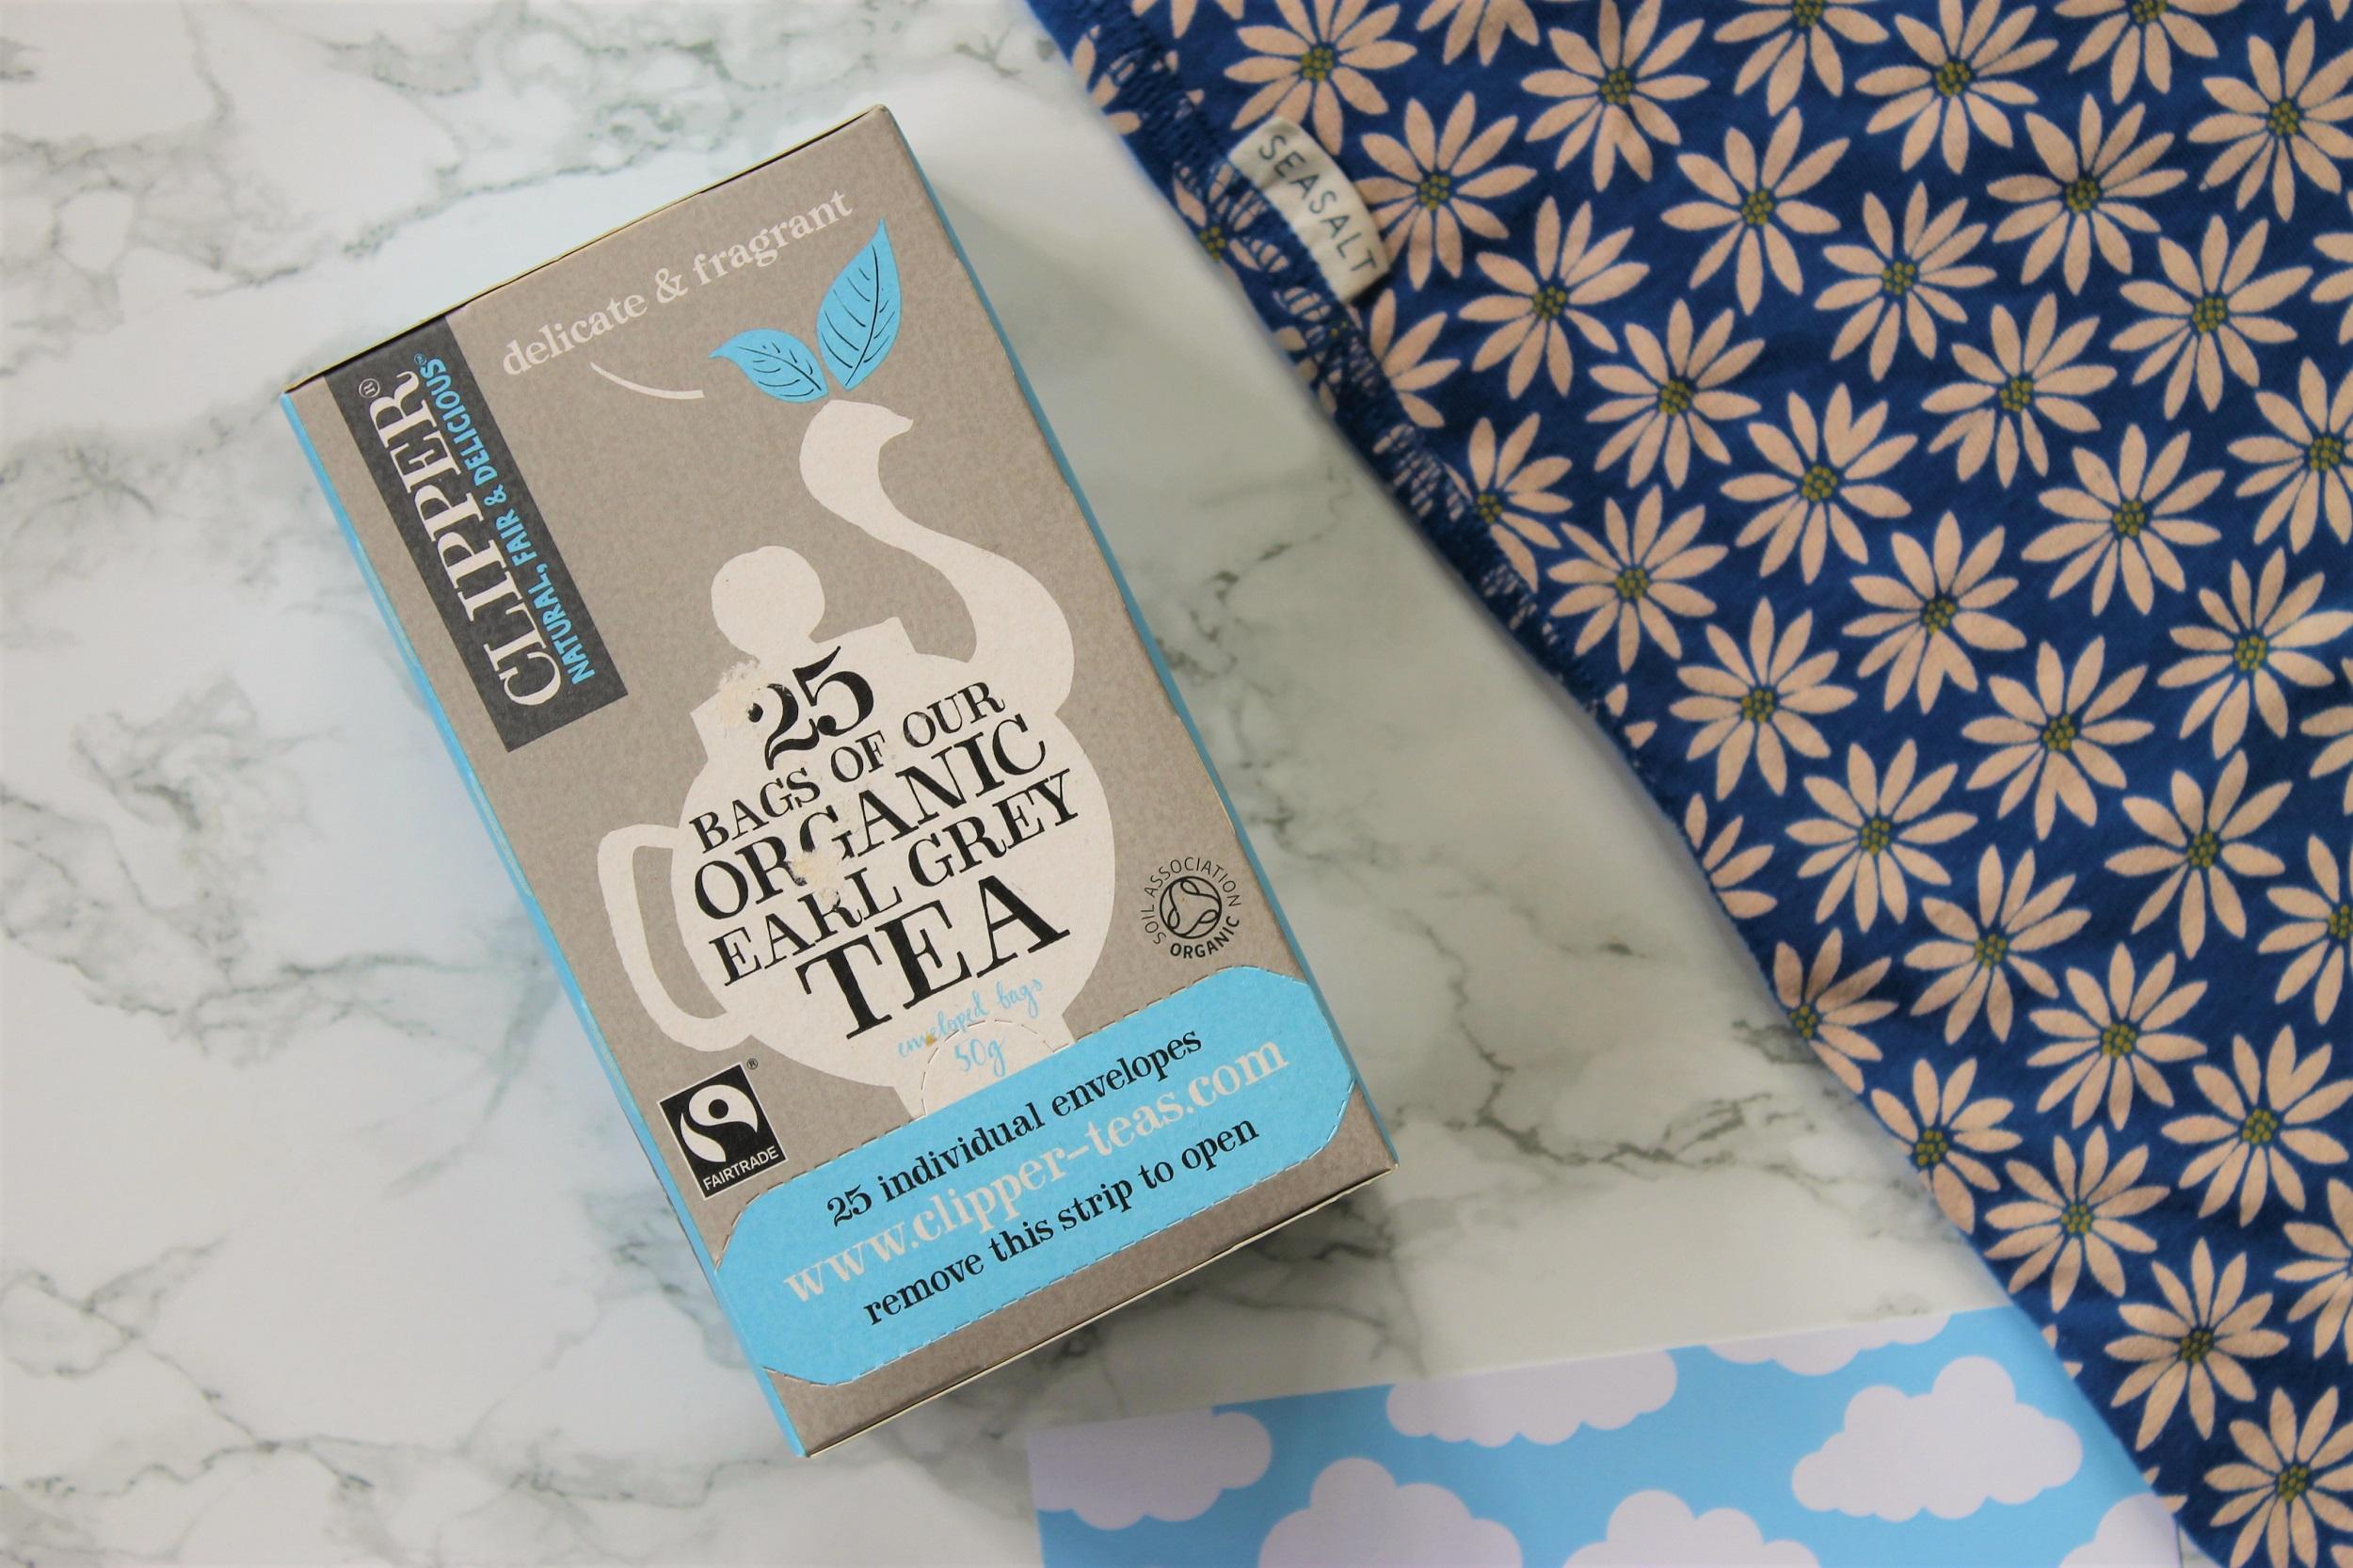 clipper earl grey teabags box